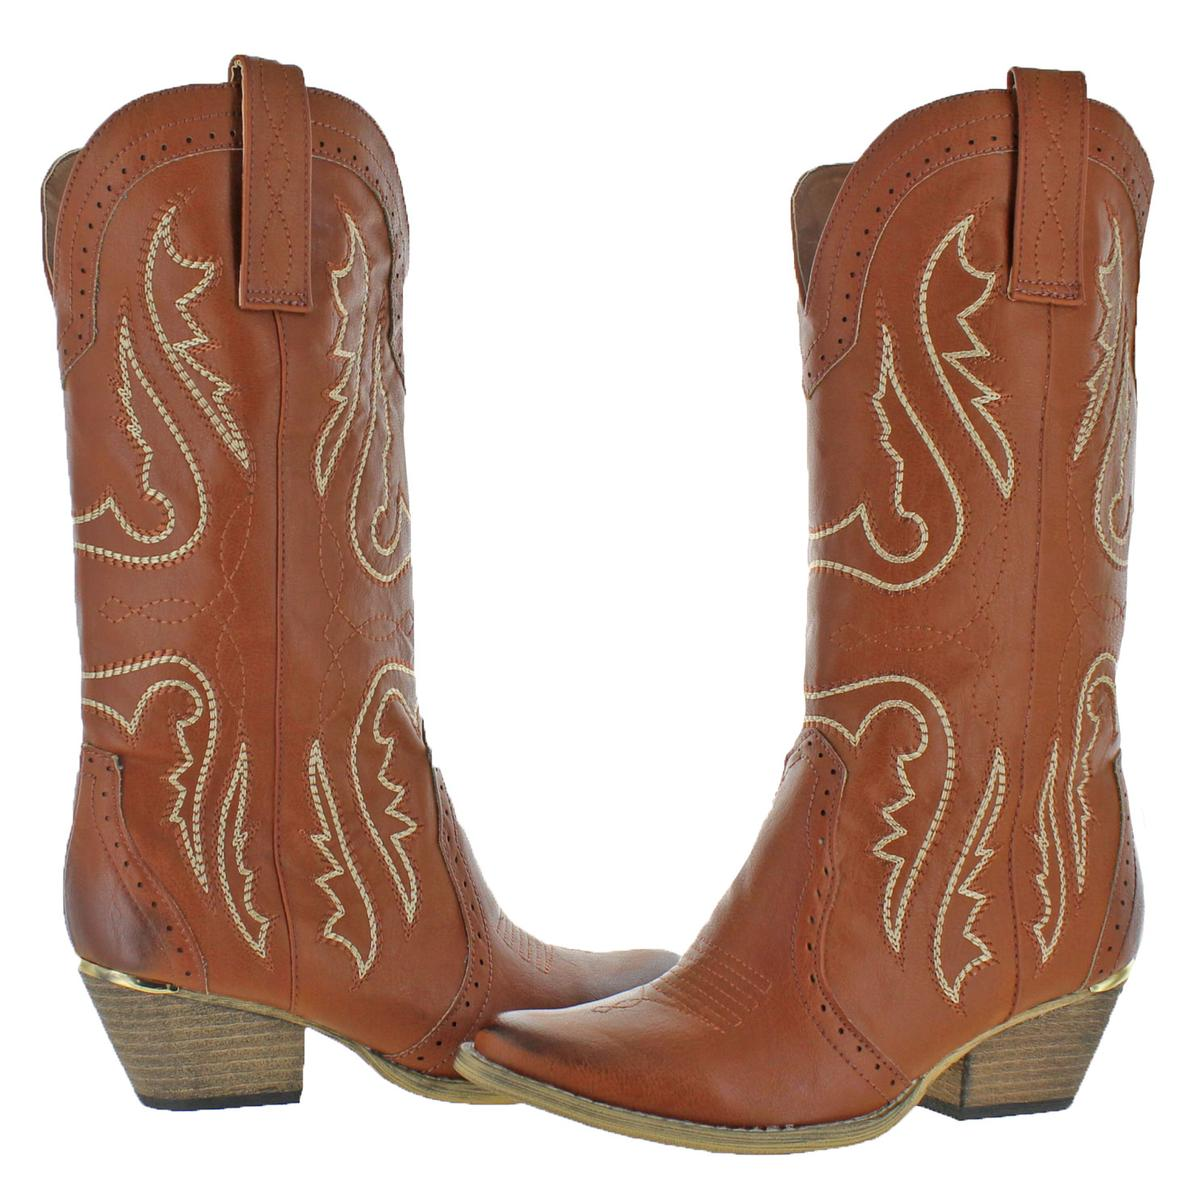 b9d6c942575 Details about Very Volatile Womens Raspy Tan Cowboy